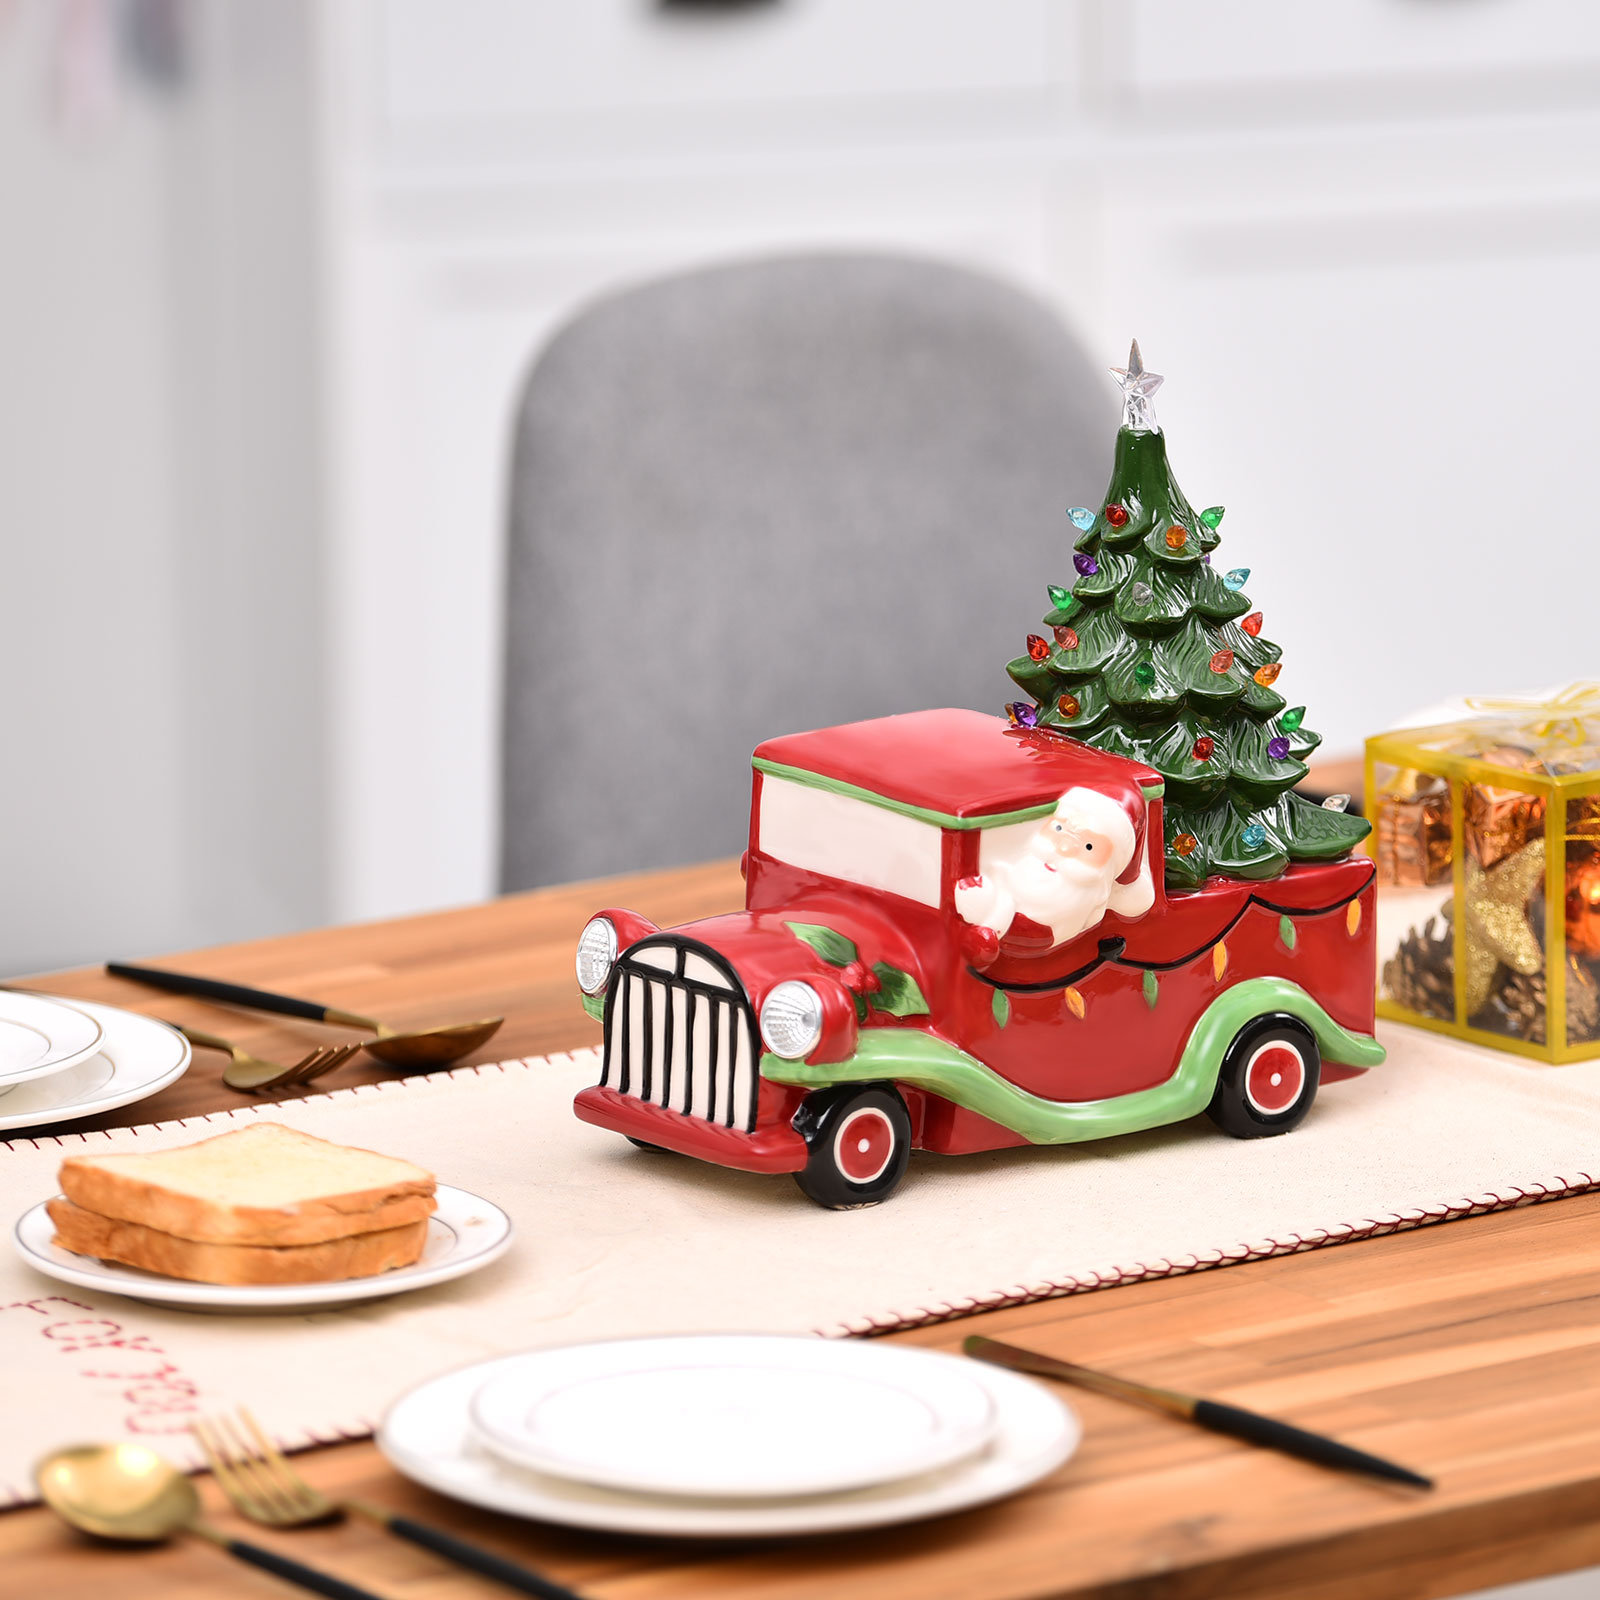 Topbuy Red Truck Christmas Decoration With Santa And Led Tree Pre Lit Vintage Ceramic Tree And Truck W Headlights Walmart Com Walmart Com